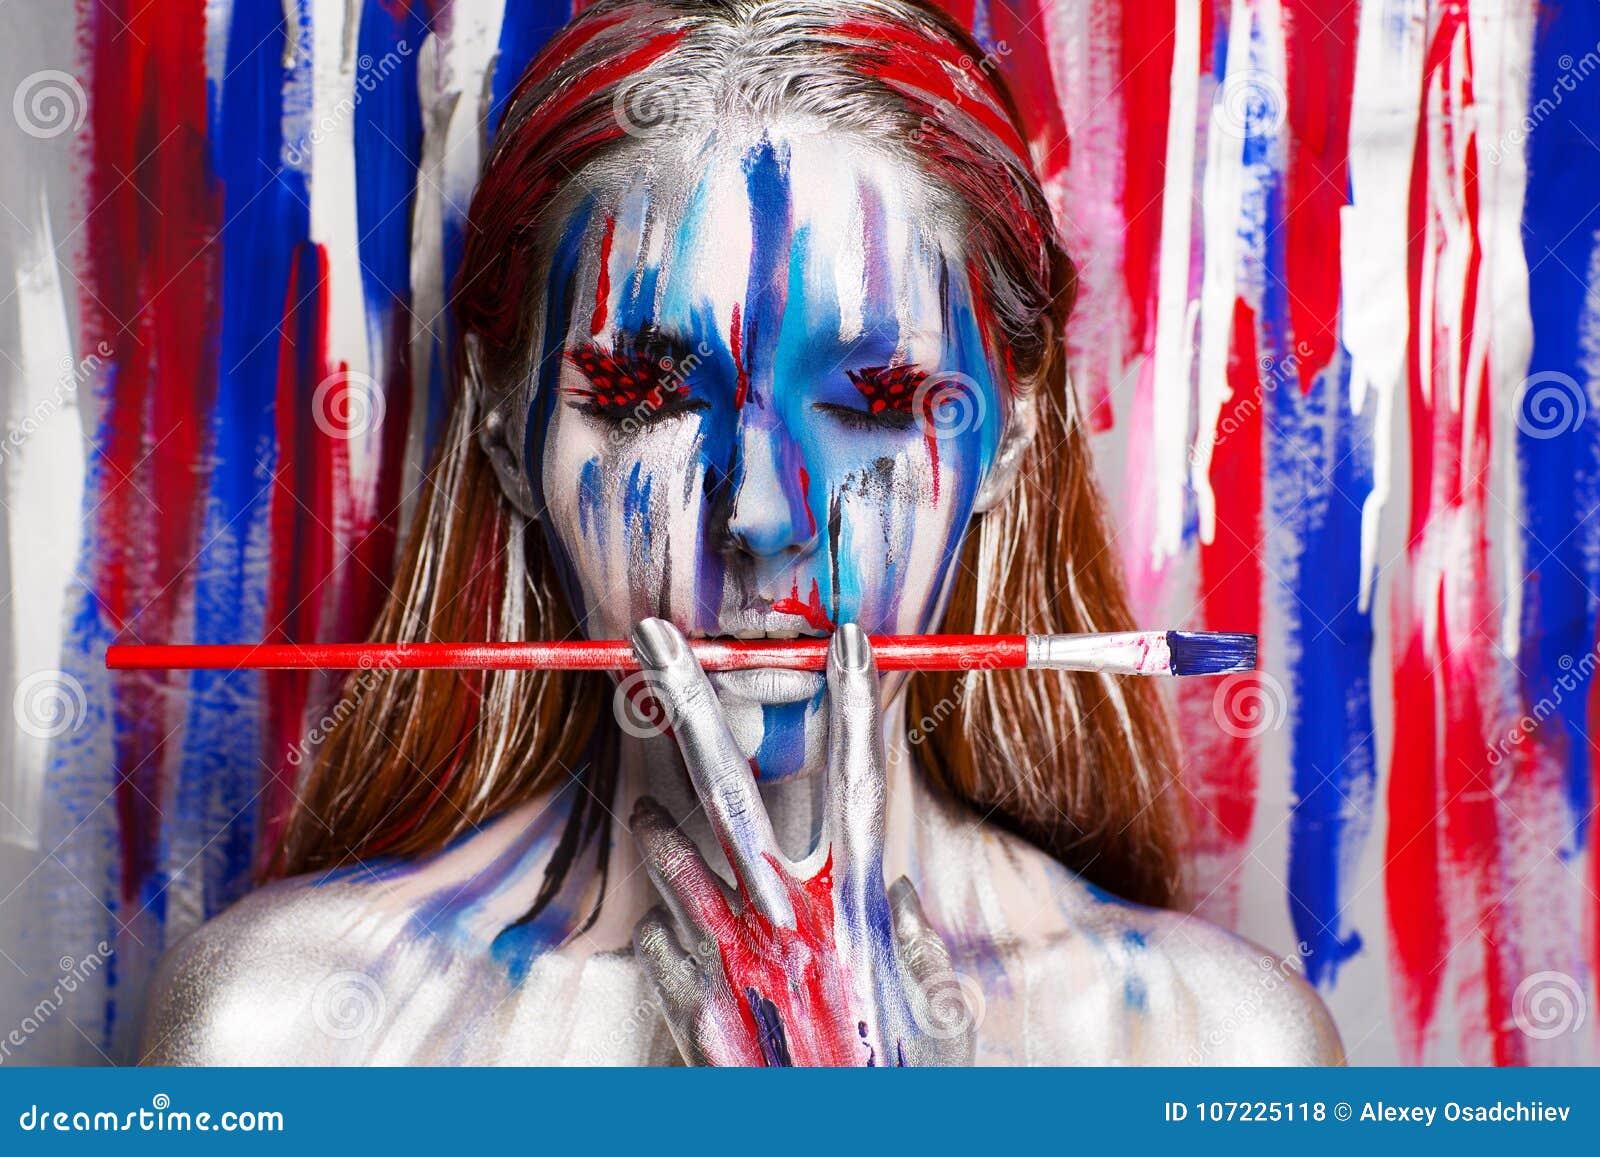 Woman artist body art